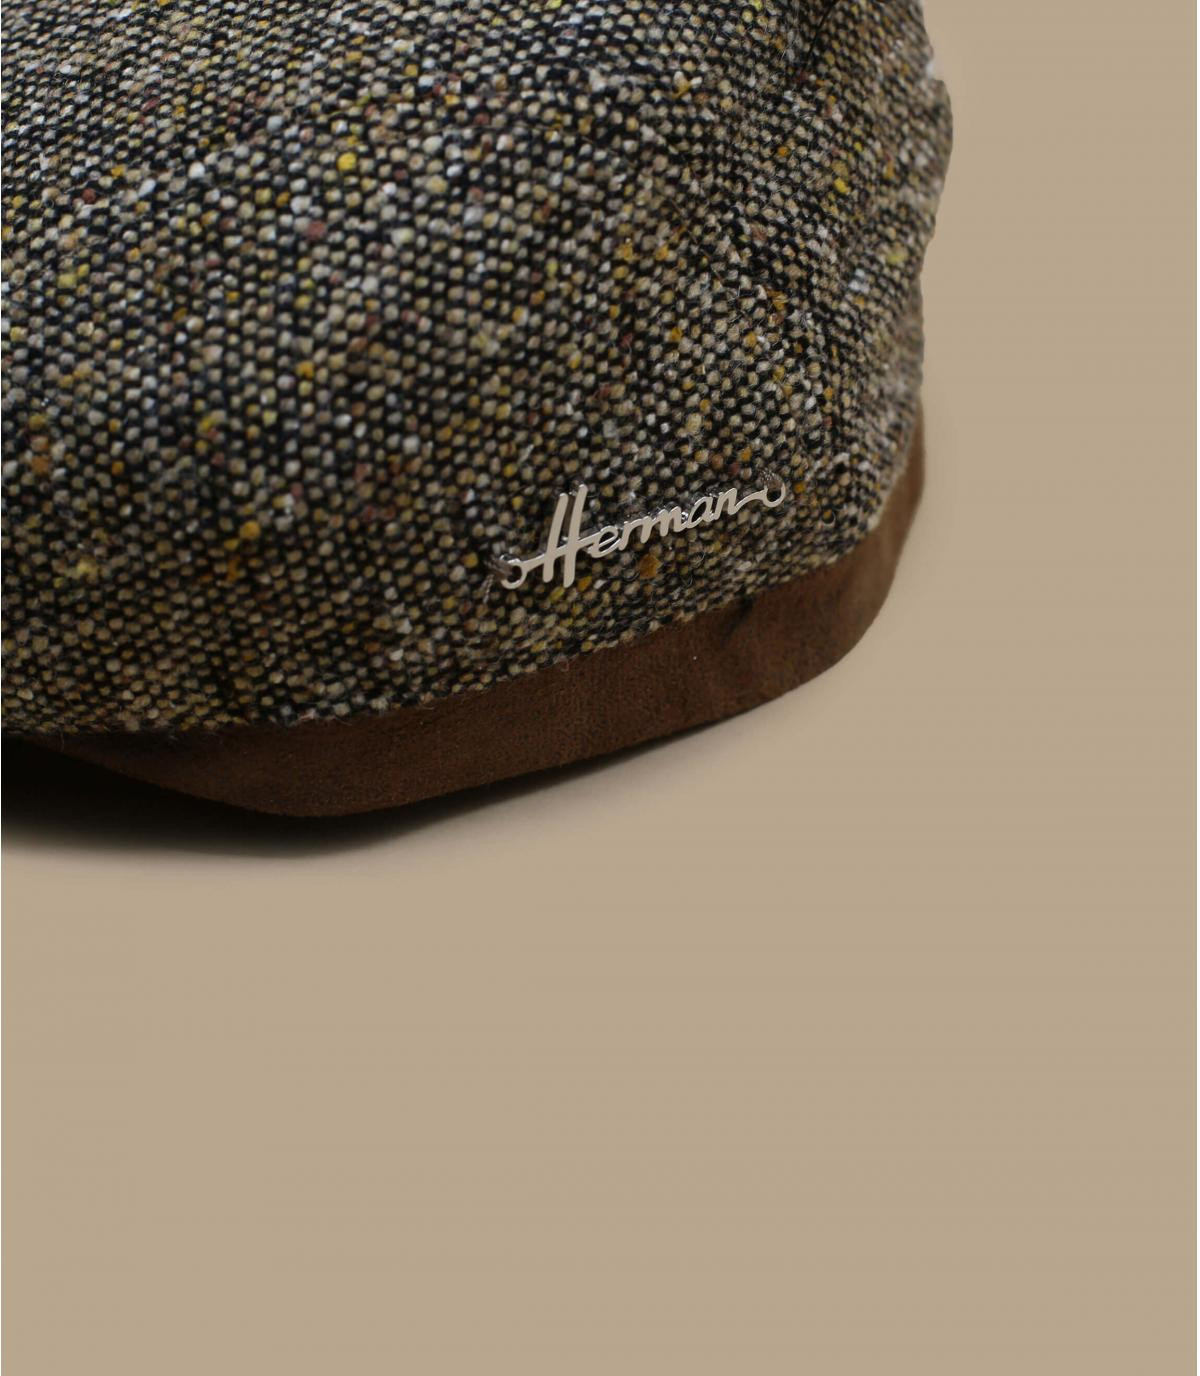 Details Grasberg Wool taupe - afbeeling 2